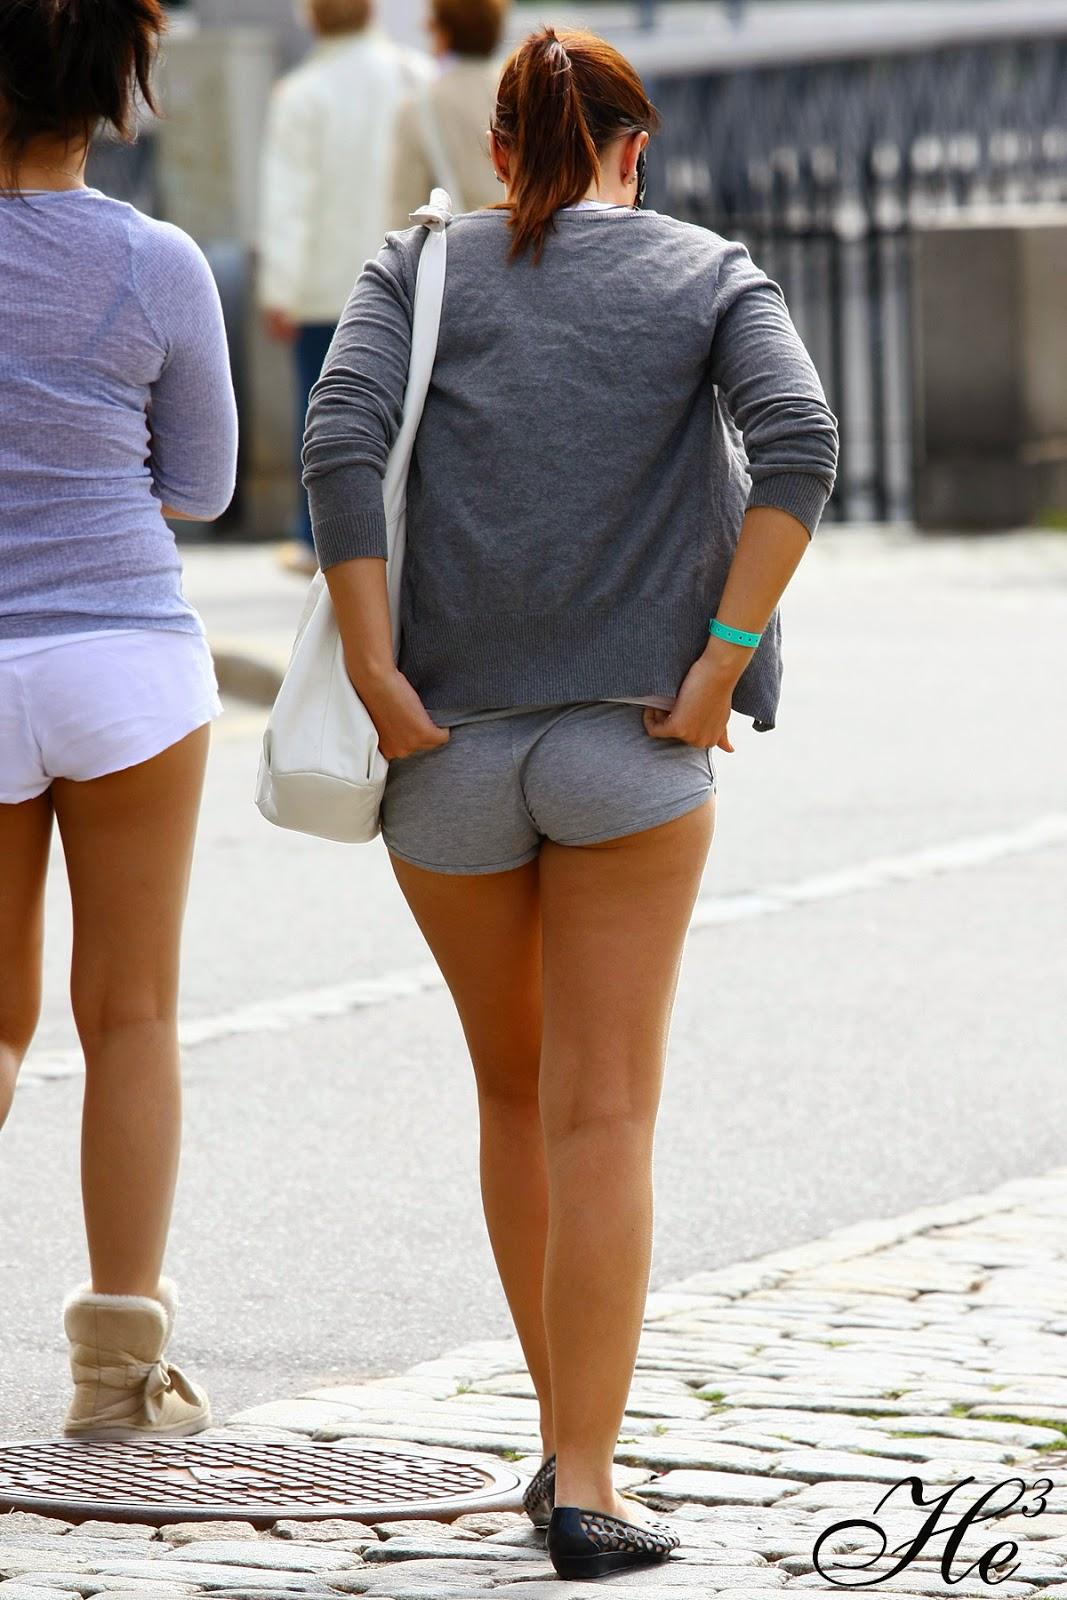 Caminando por la calle - XVIDEOSCOM